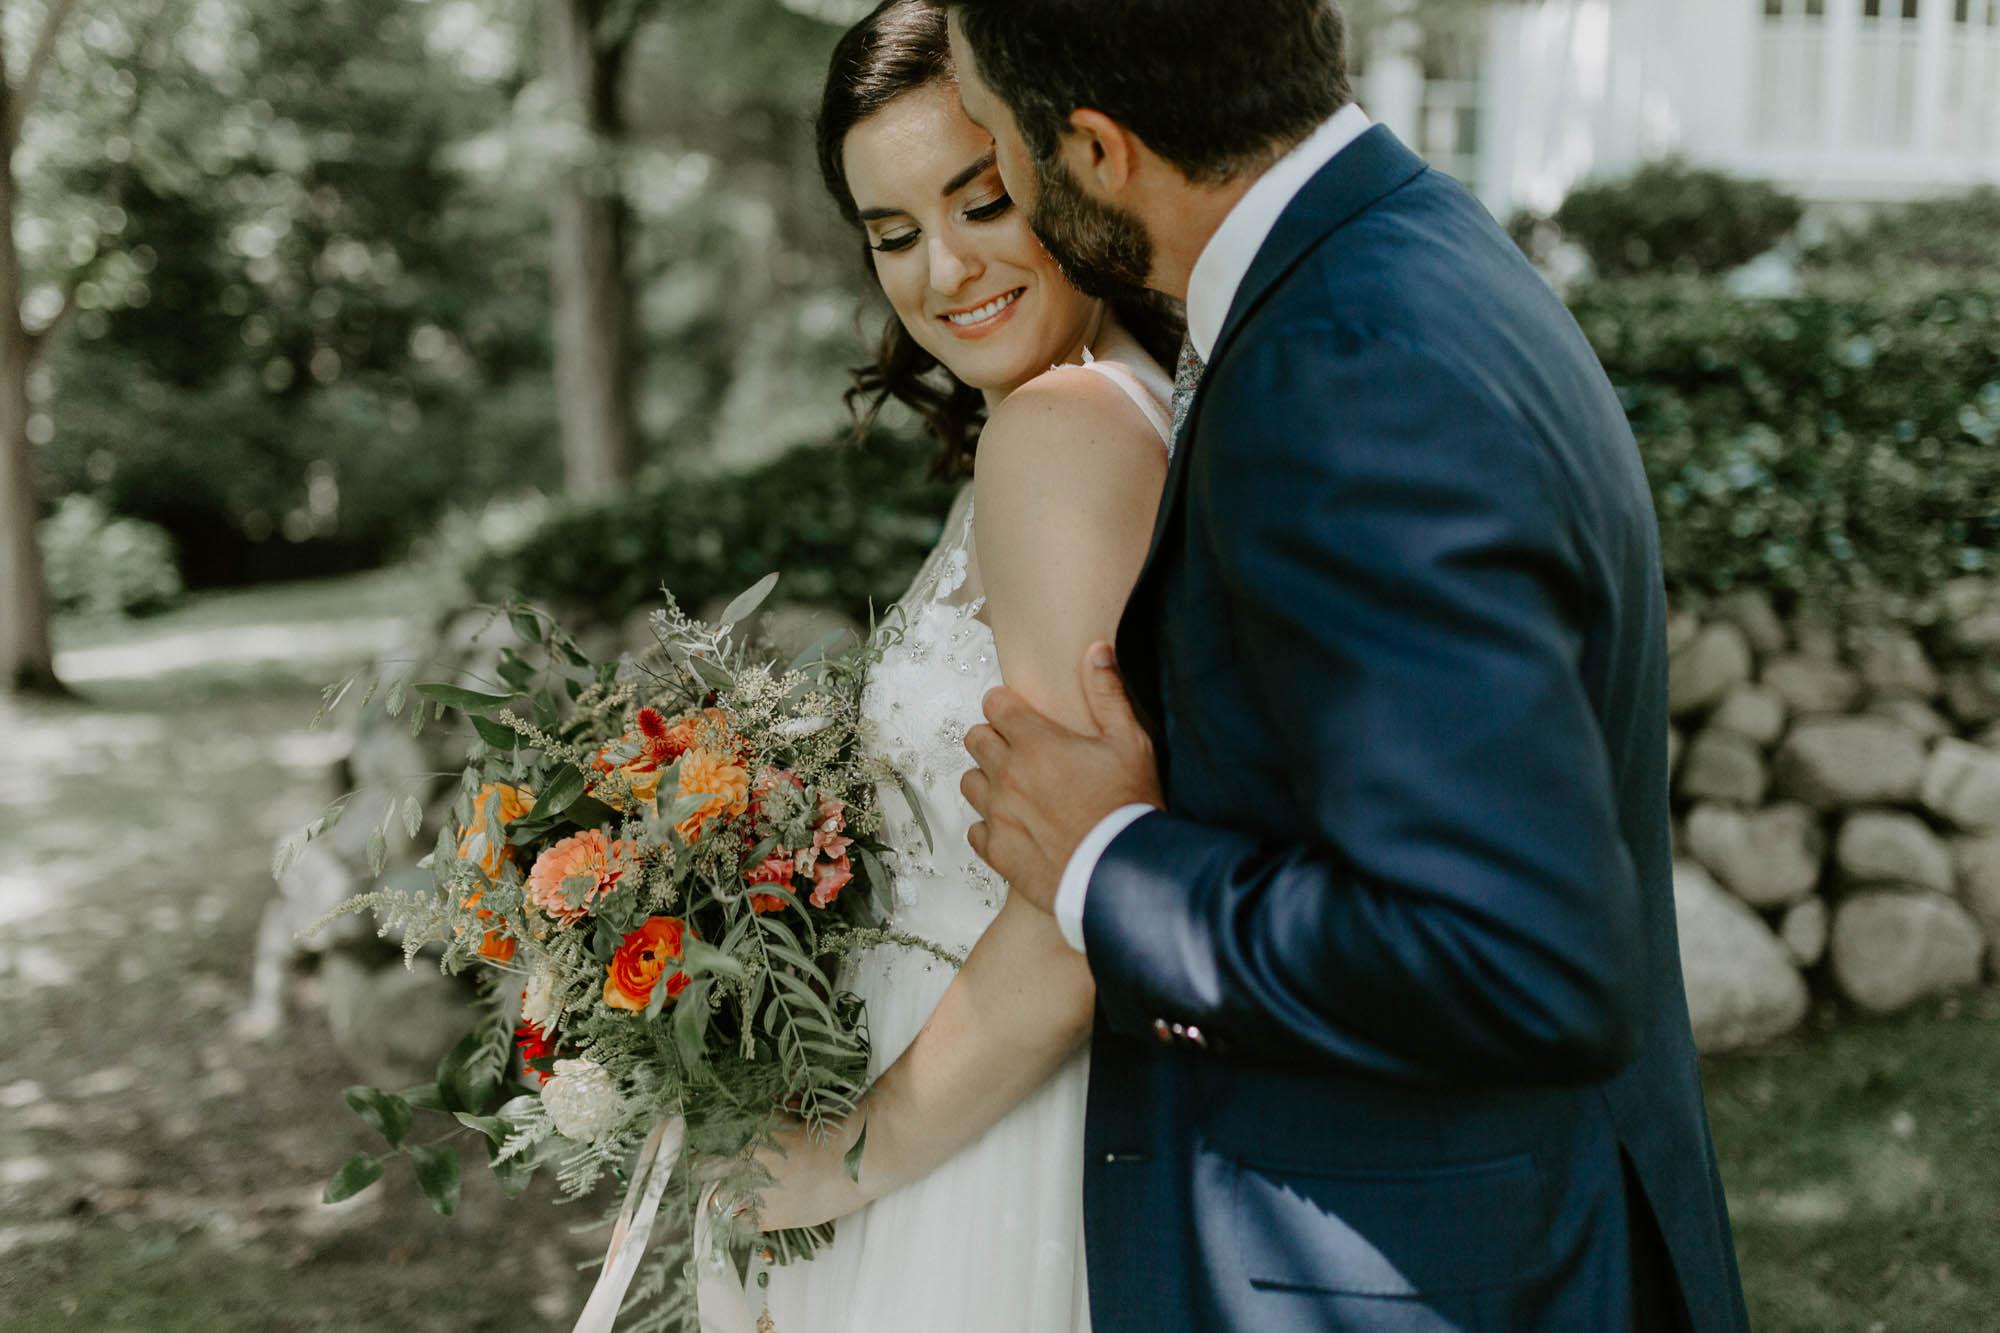 journeyman_distillery_wedding_photographer_chicago_il_wright_photographs-1654.jpg